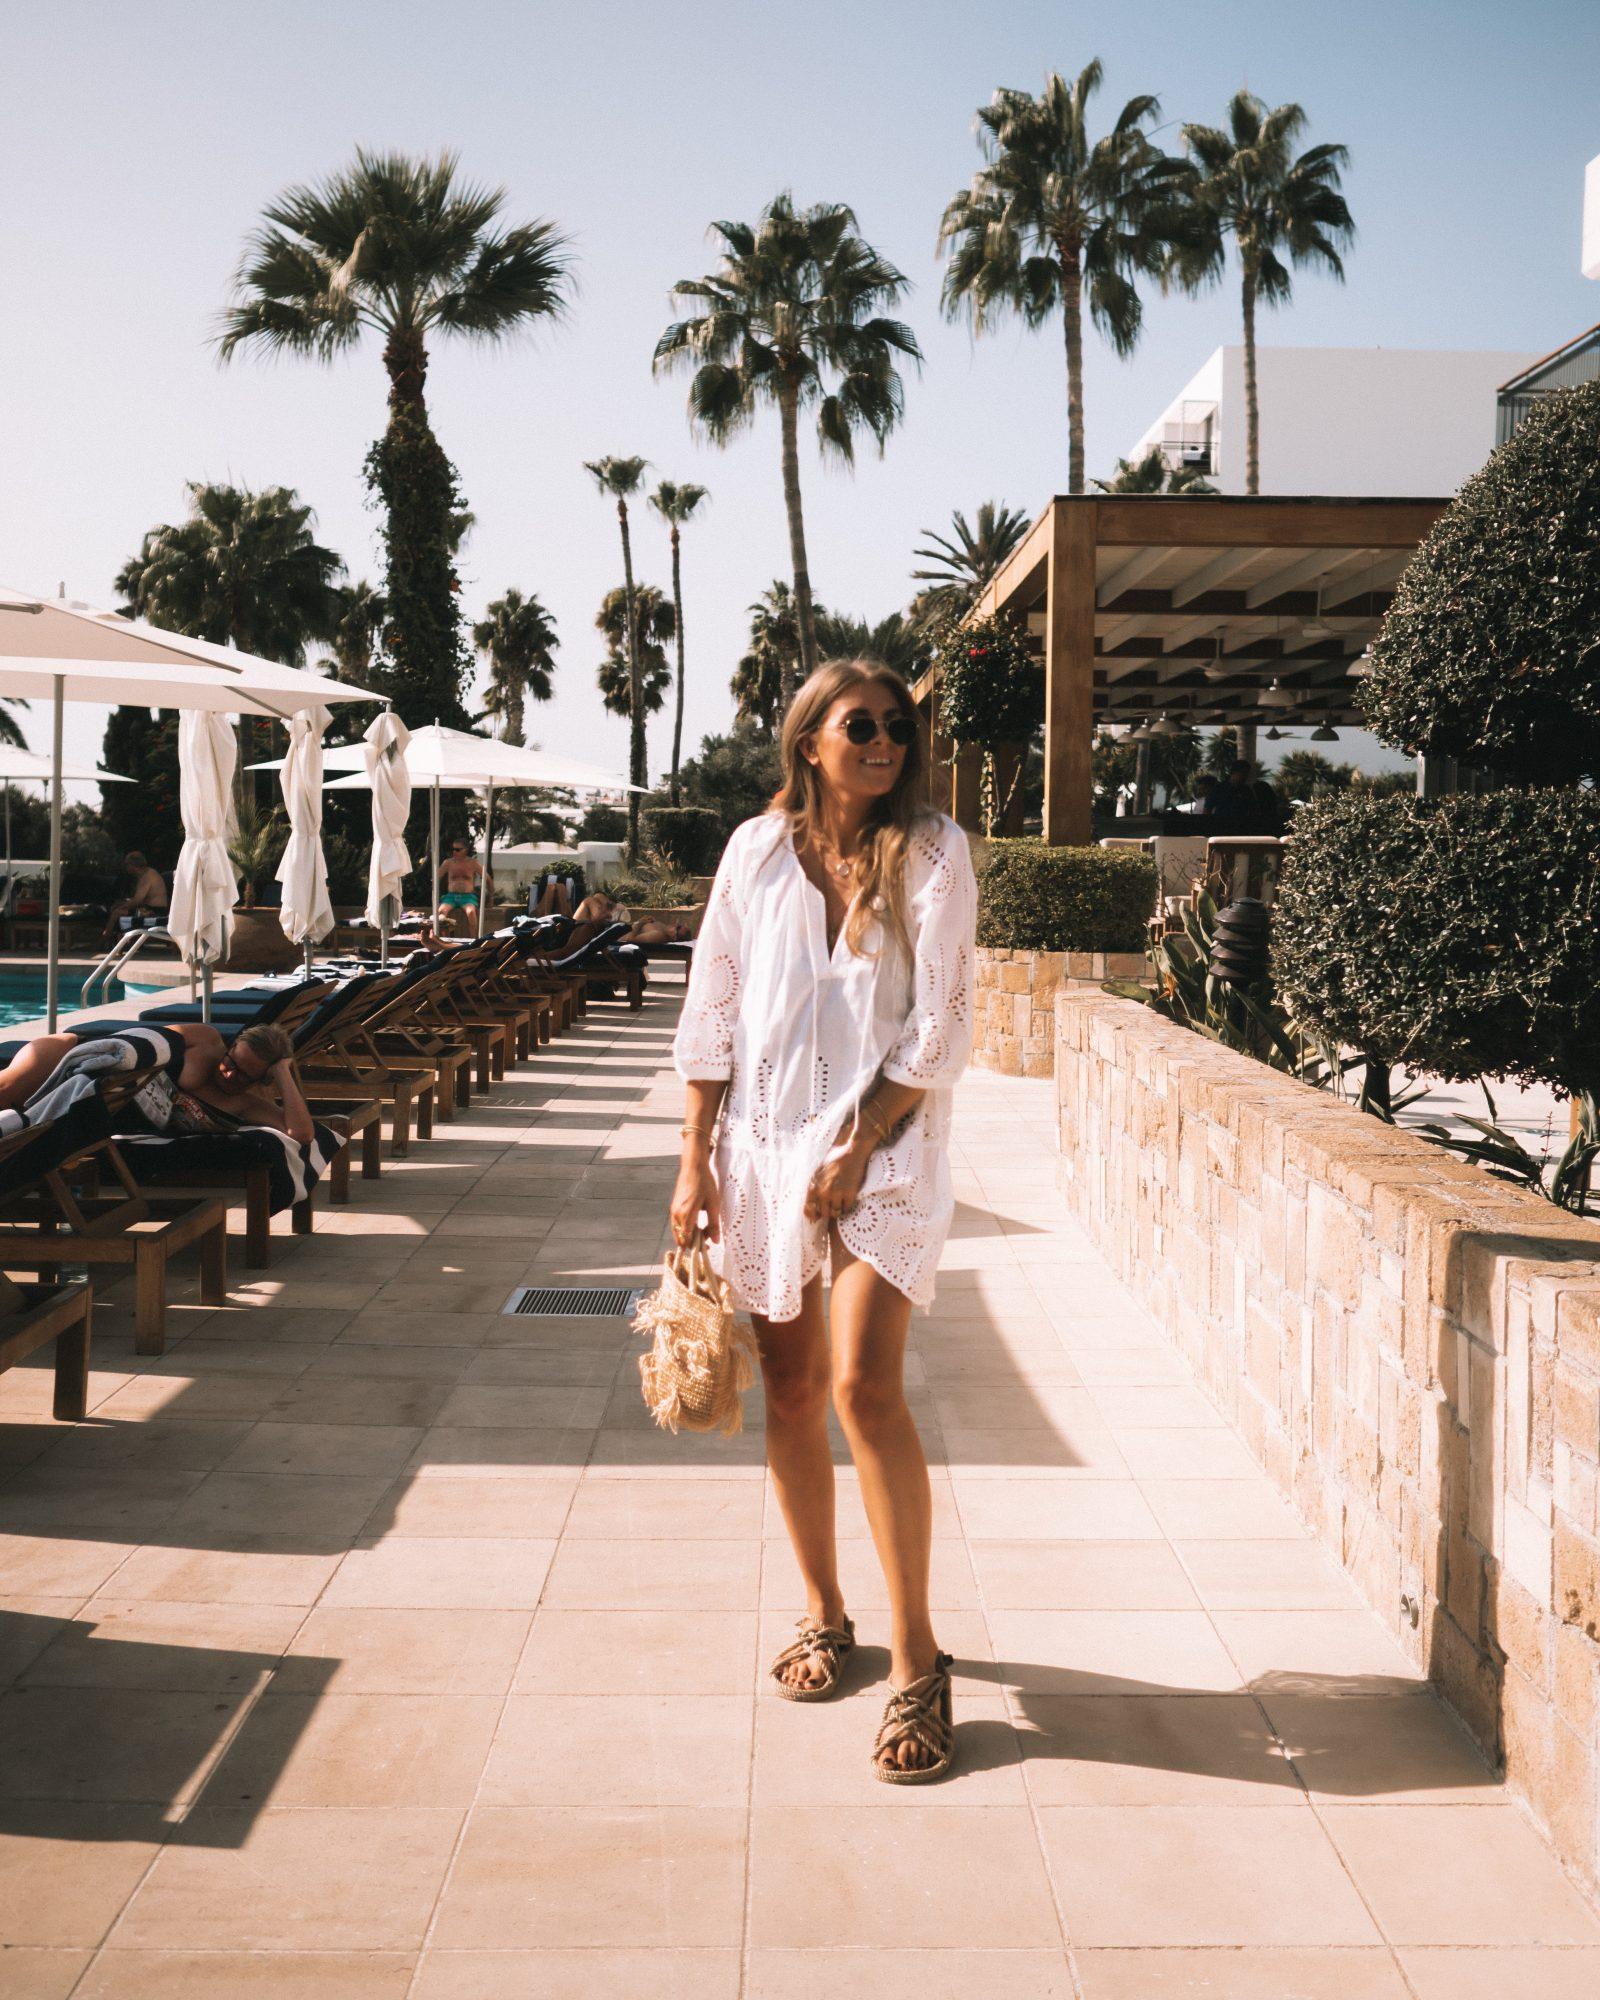 Annabelle Hotel Cyprus - Melissa Odabash